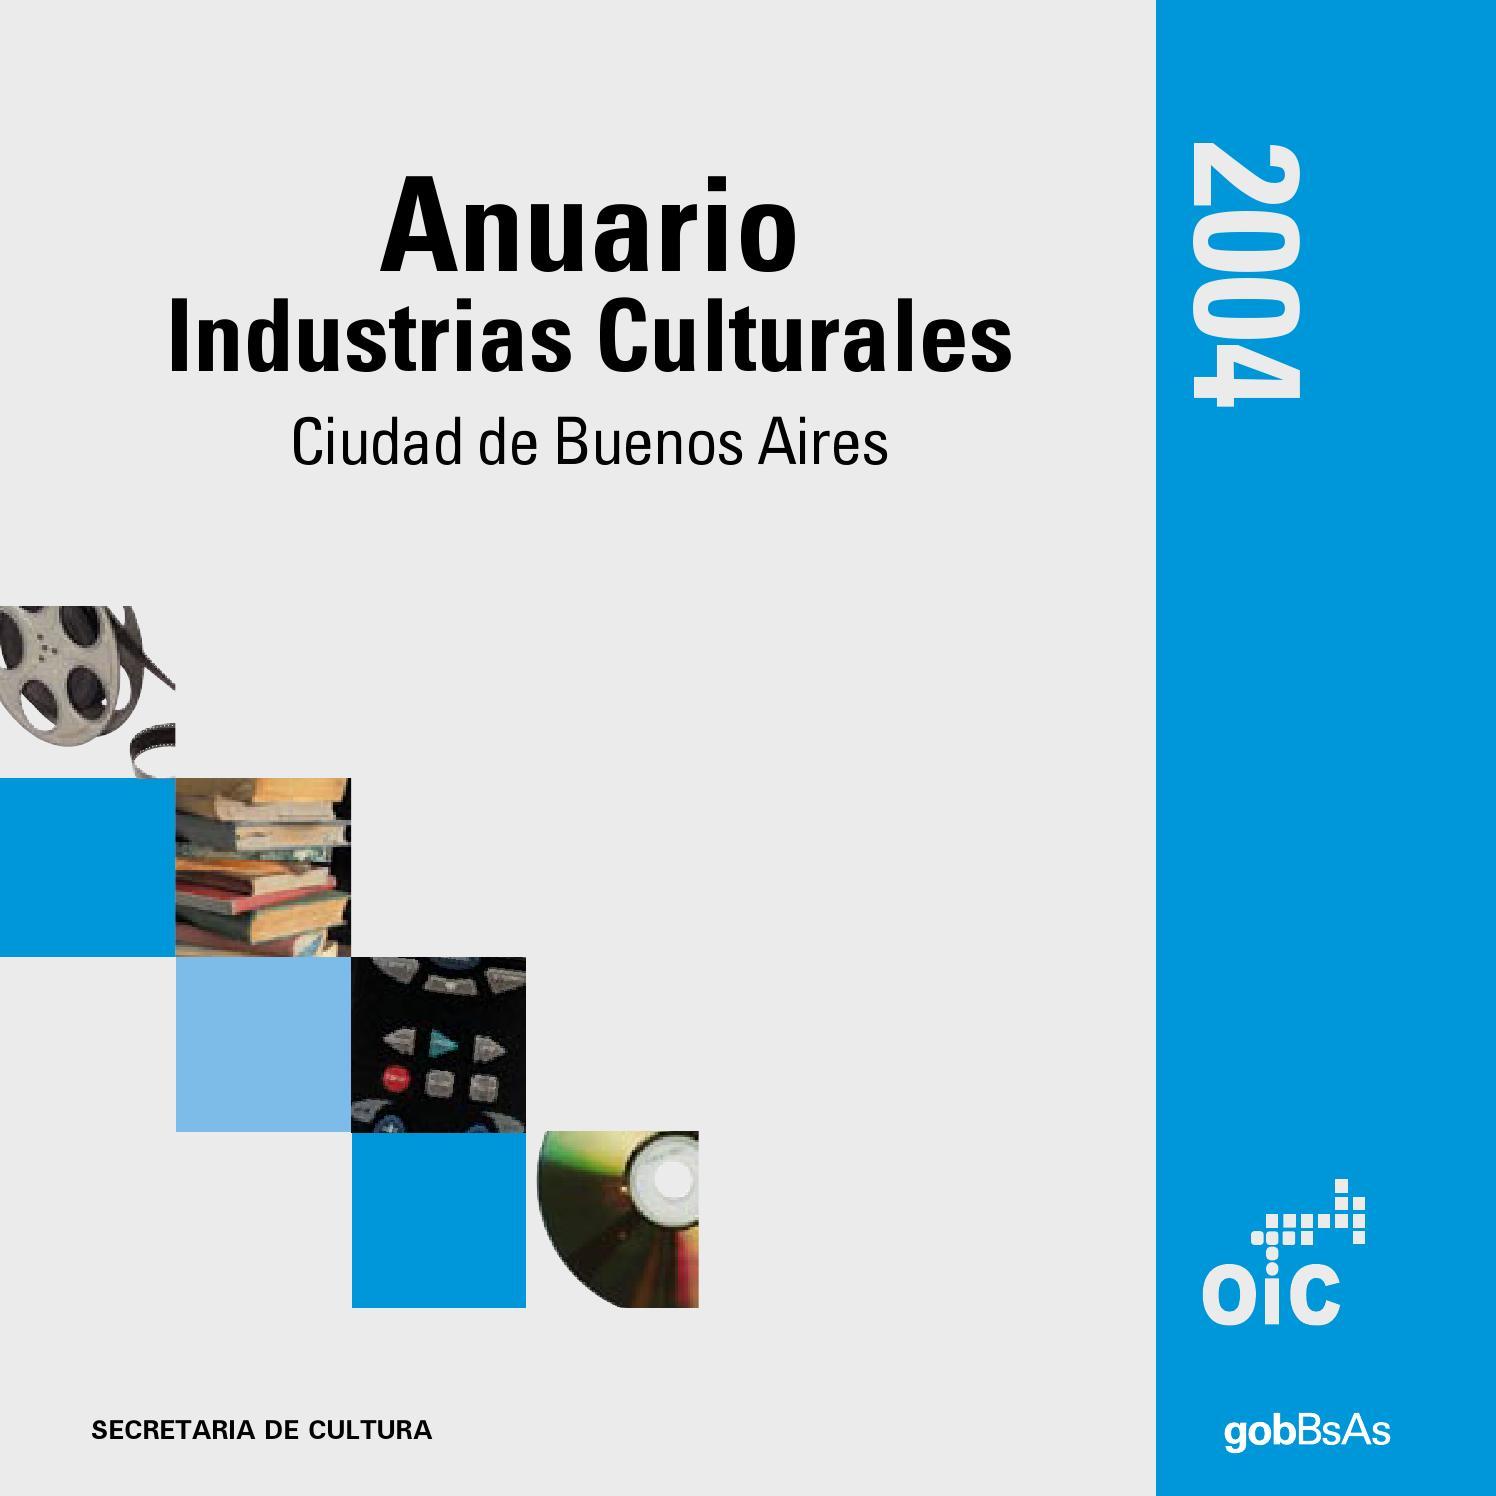 OIC - Anuario 2004 by Camara Argentina del Libro - issuu